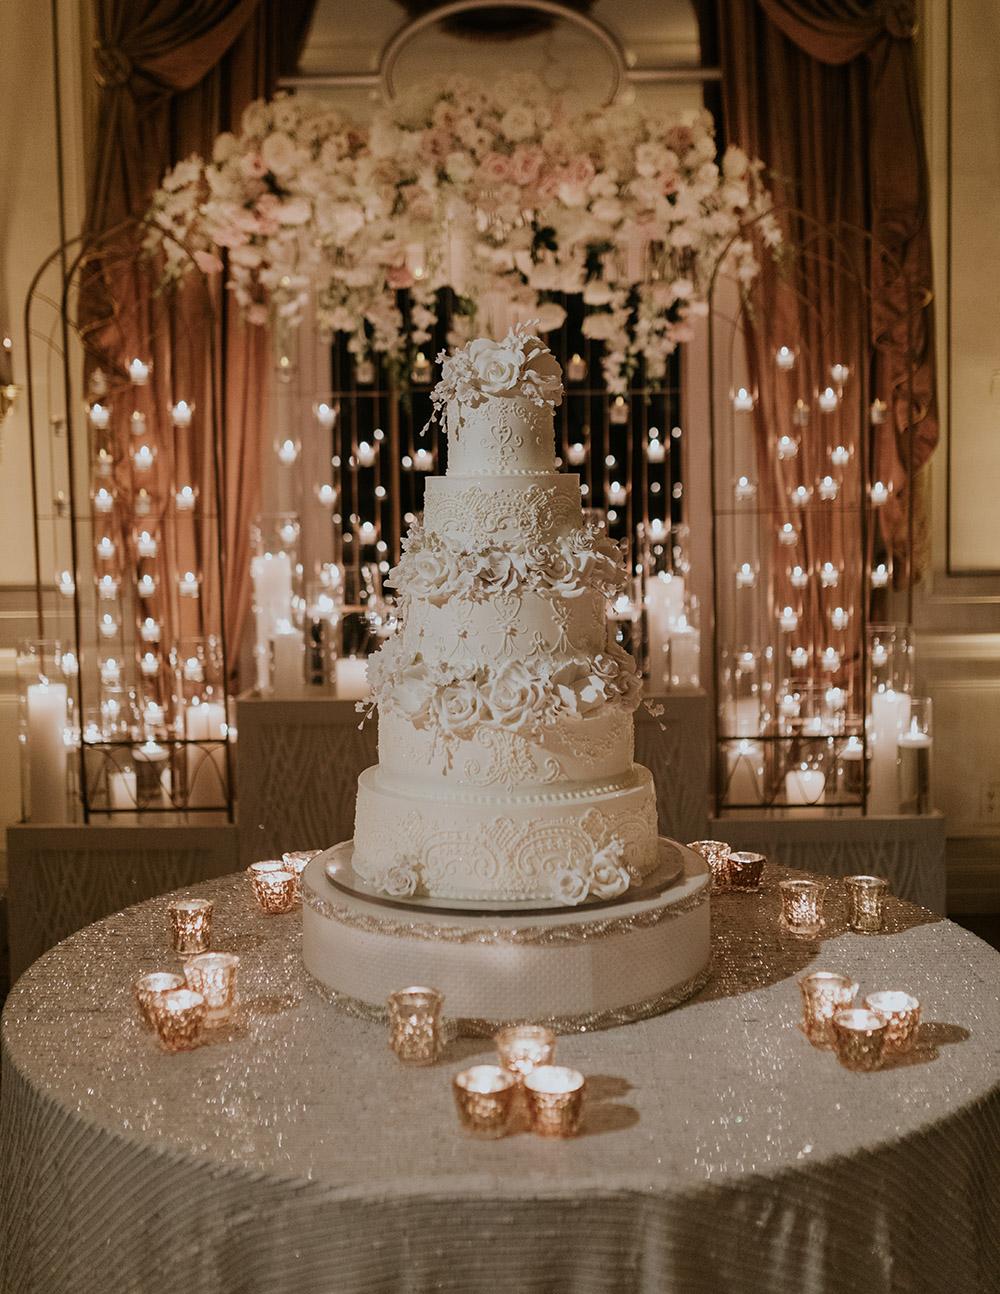 Cake By Royal Cakery | Photo By: Calvin Gavion